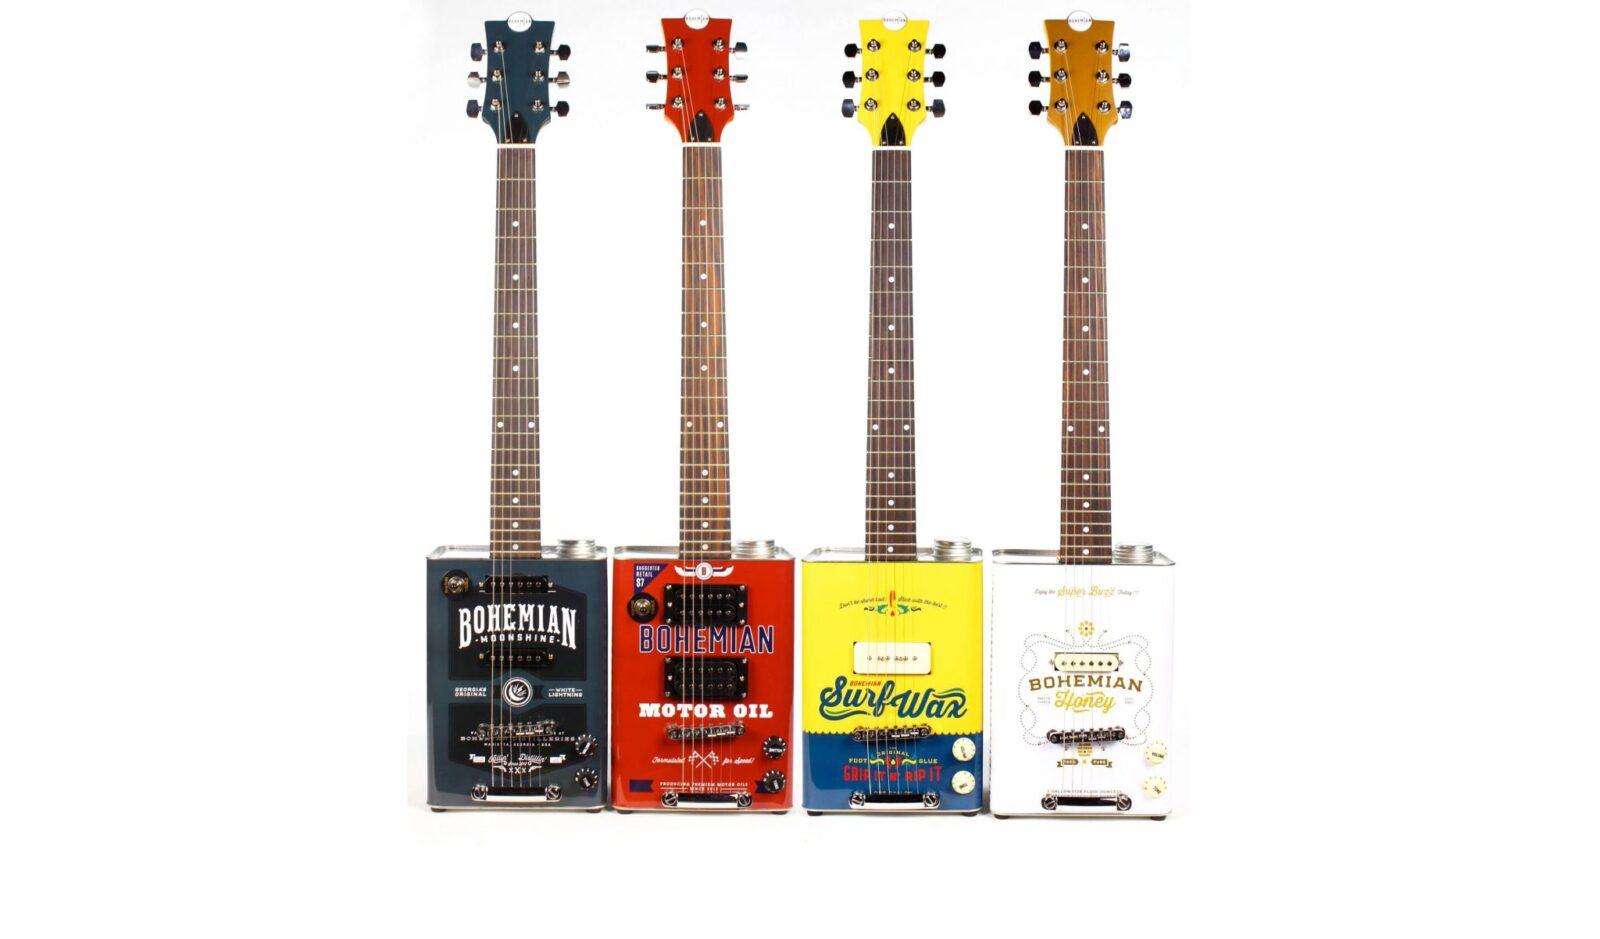 Bohemian Guitars e1501497287499 1600x939 - Bohemian Guitars